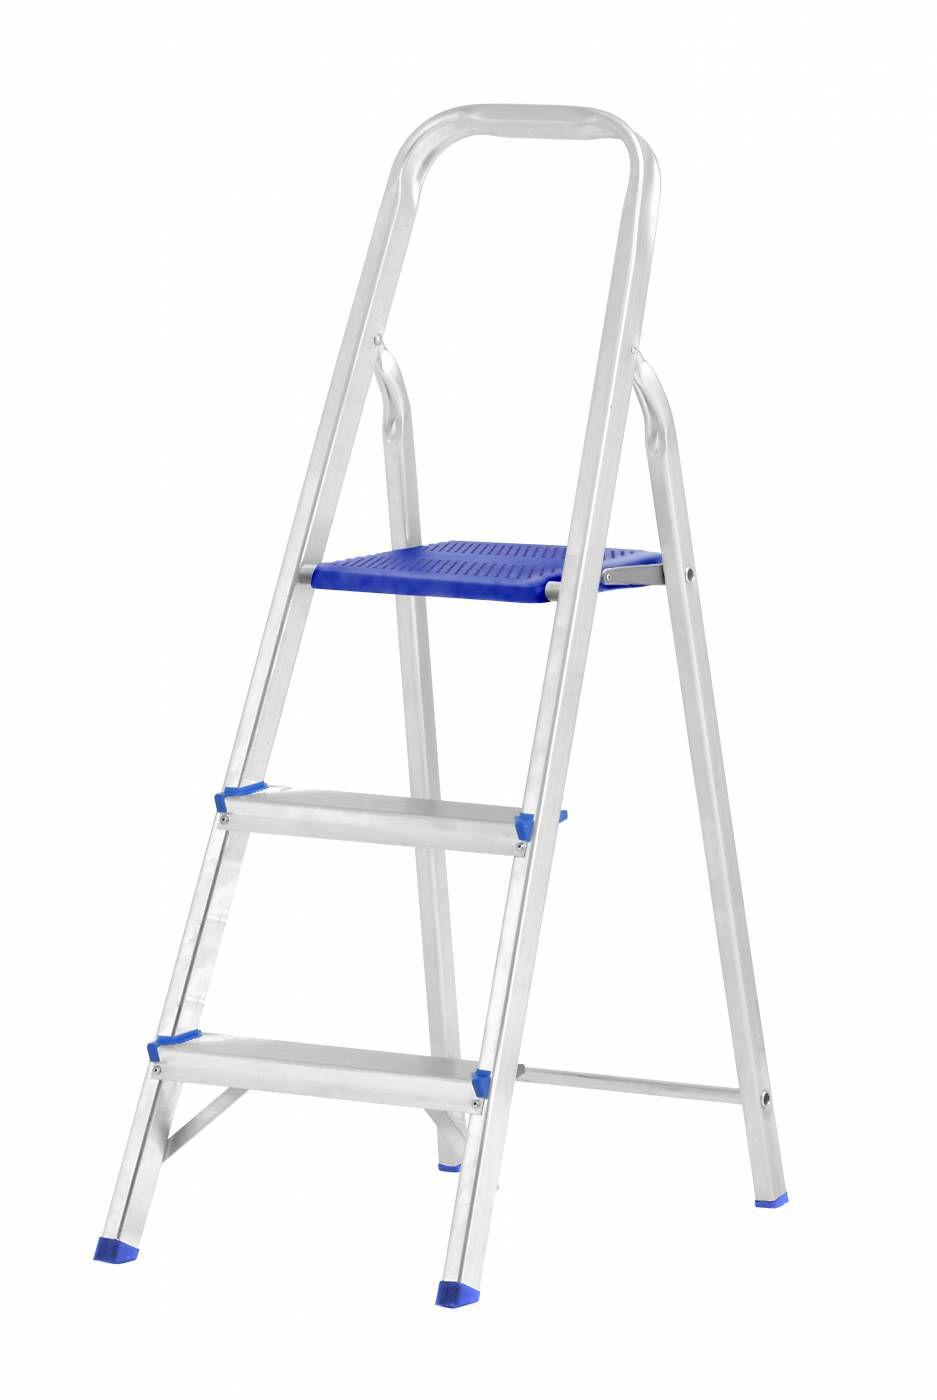 Escada Alumínio 3 Degraus - SBA